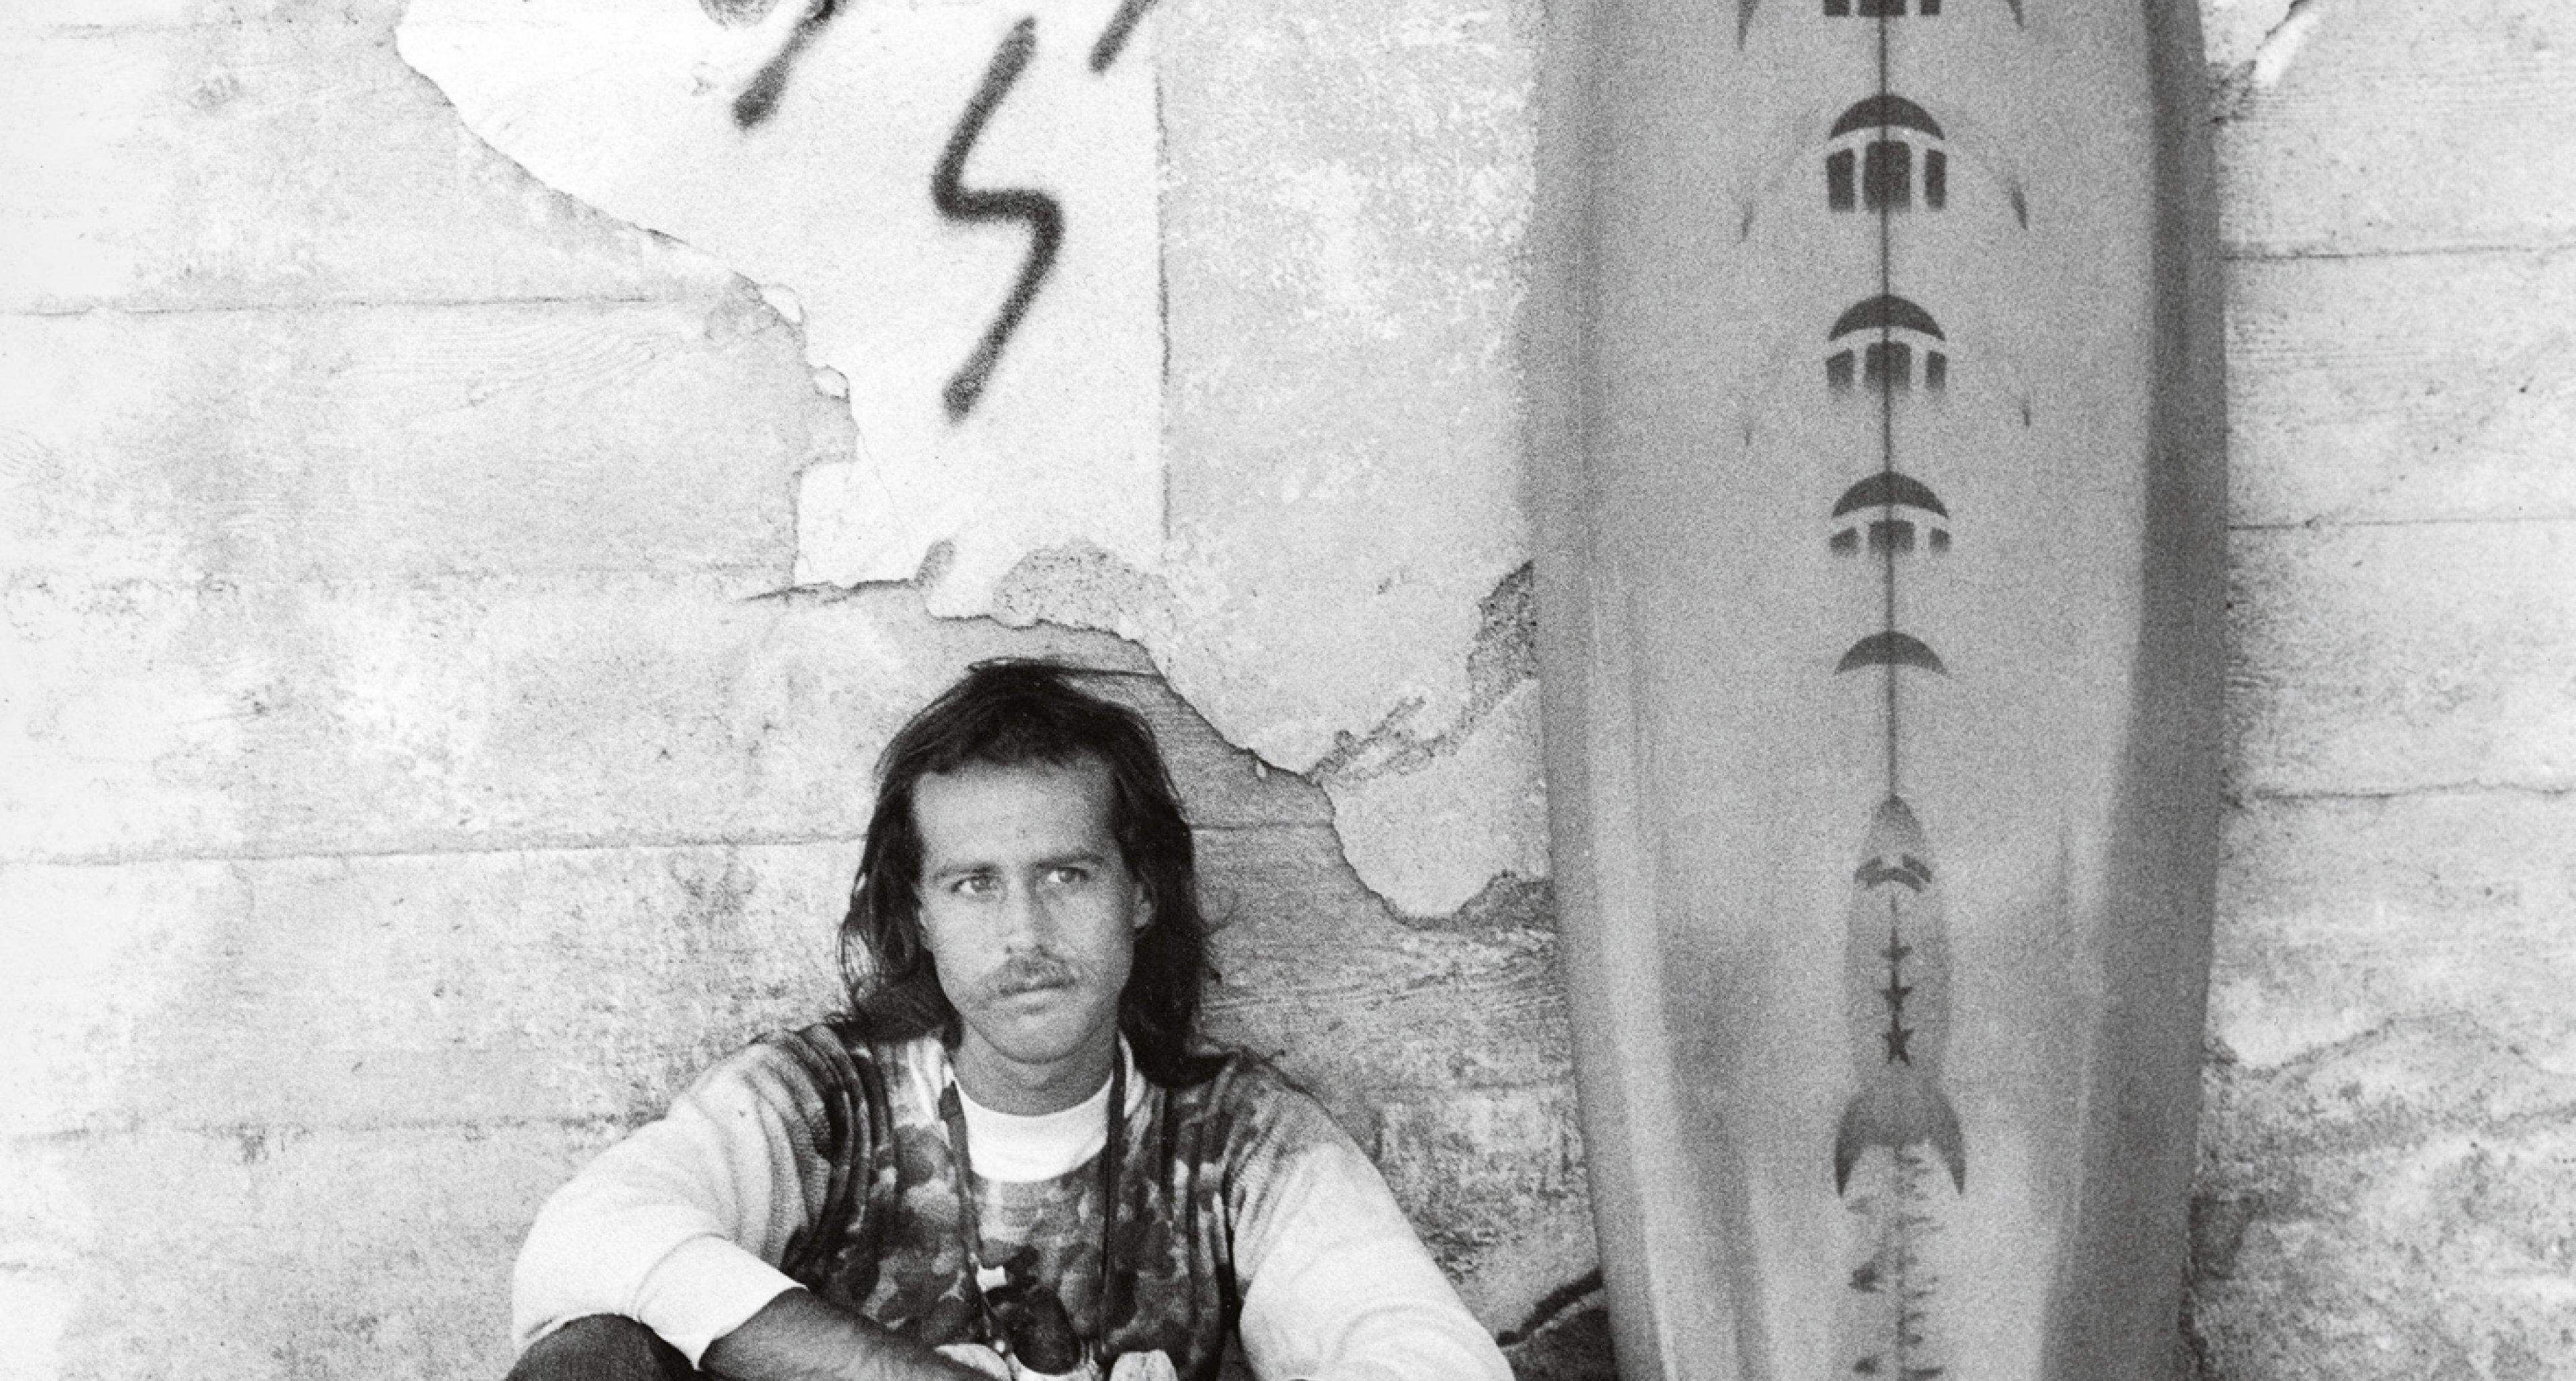 Craig Stecyk; Venice, California; 1974. Anthony Friedkin / Courtesy TASCHEN